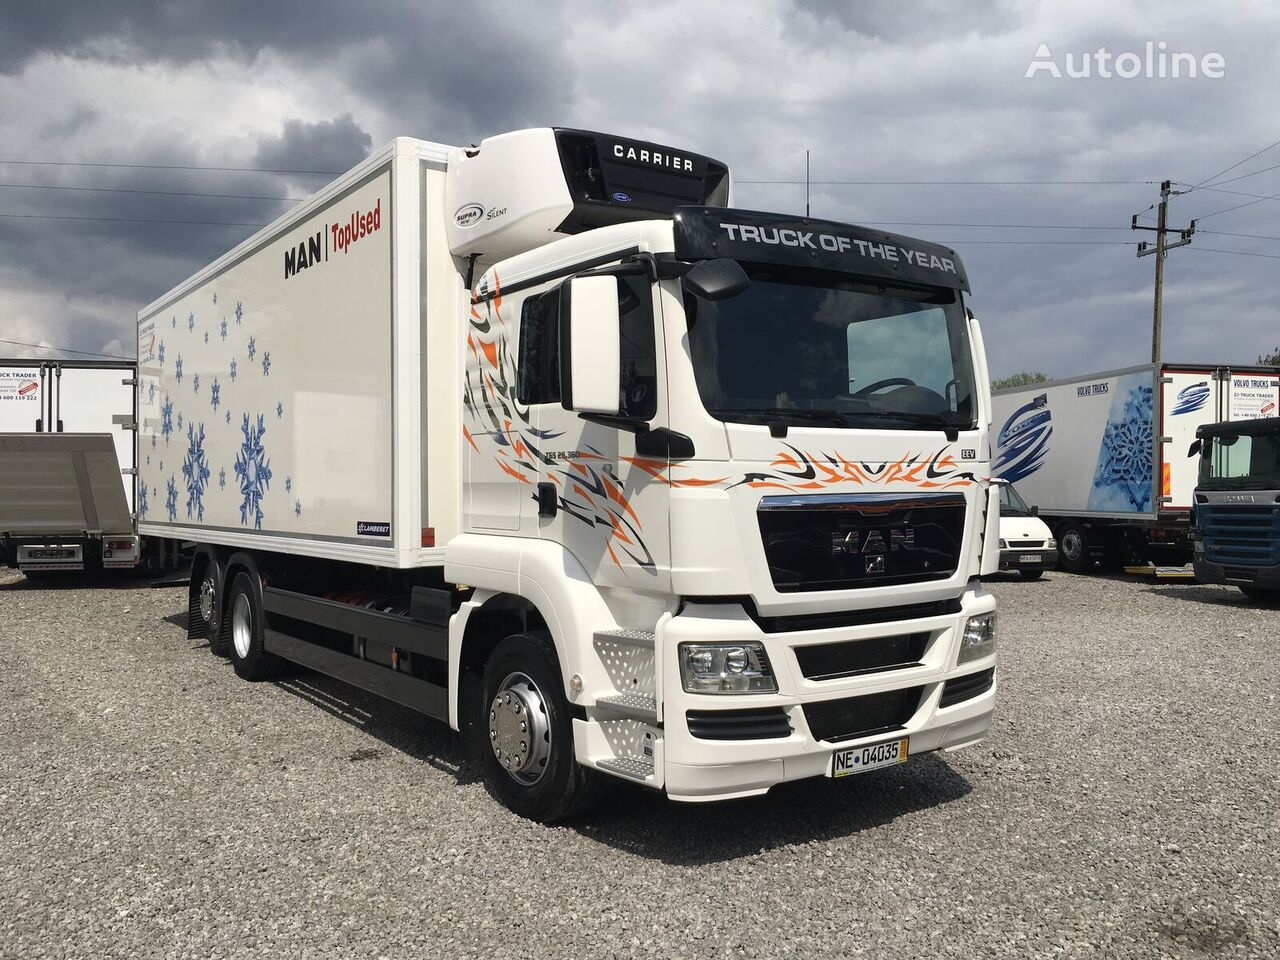 MAN TGX TGS 26.360 6x2 Multitemperatura , Super Stan ! kamion hladnjača